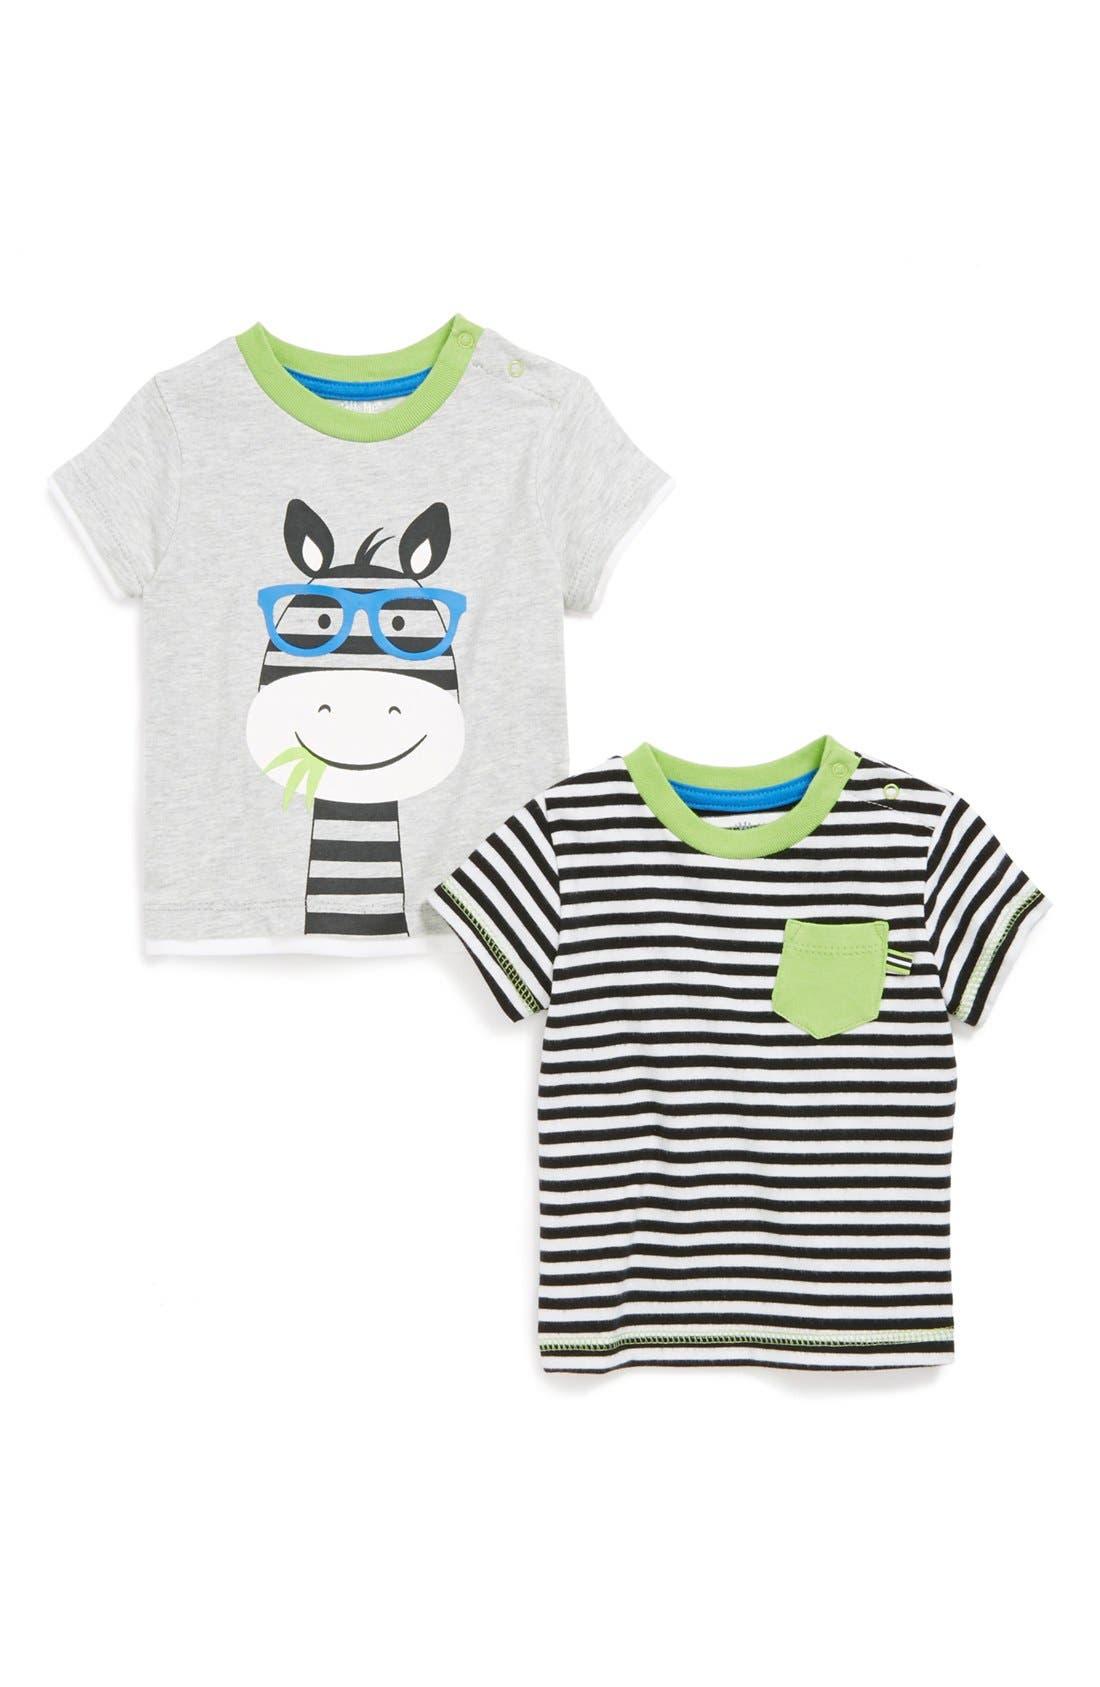 Main Image - Little Me 'Zebra' T-Shirts (2-Pack) (Baby Boys)